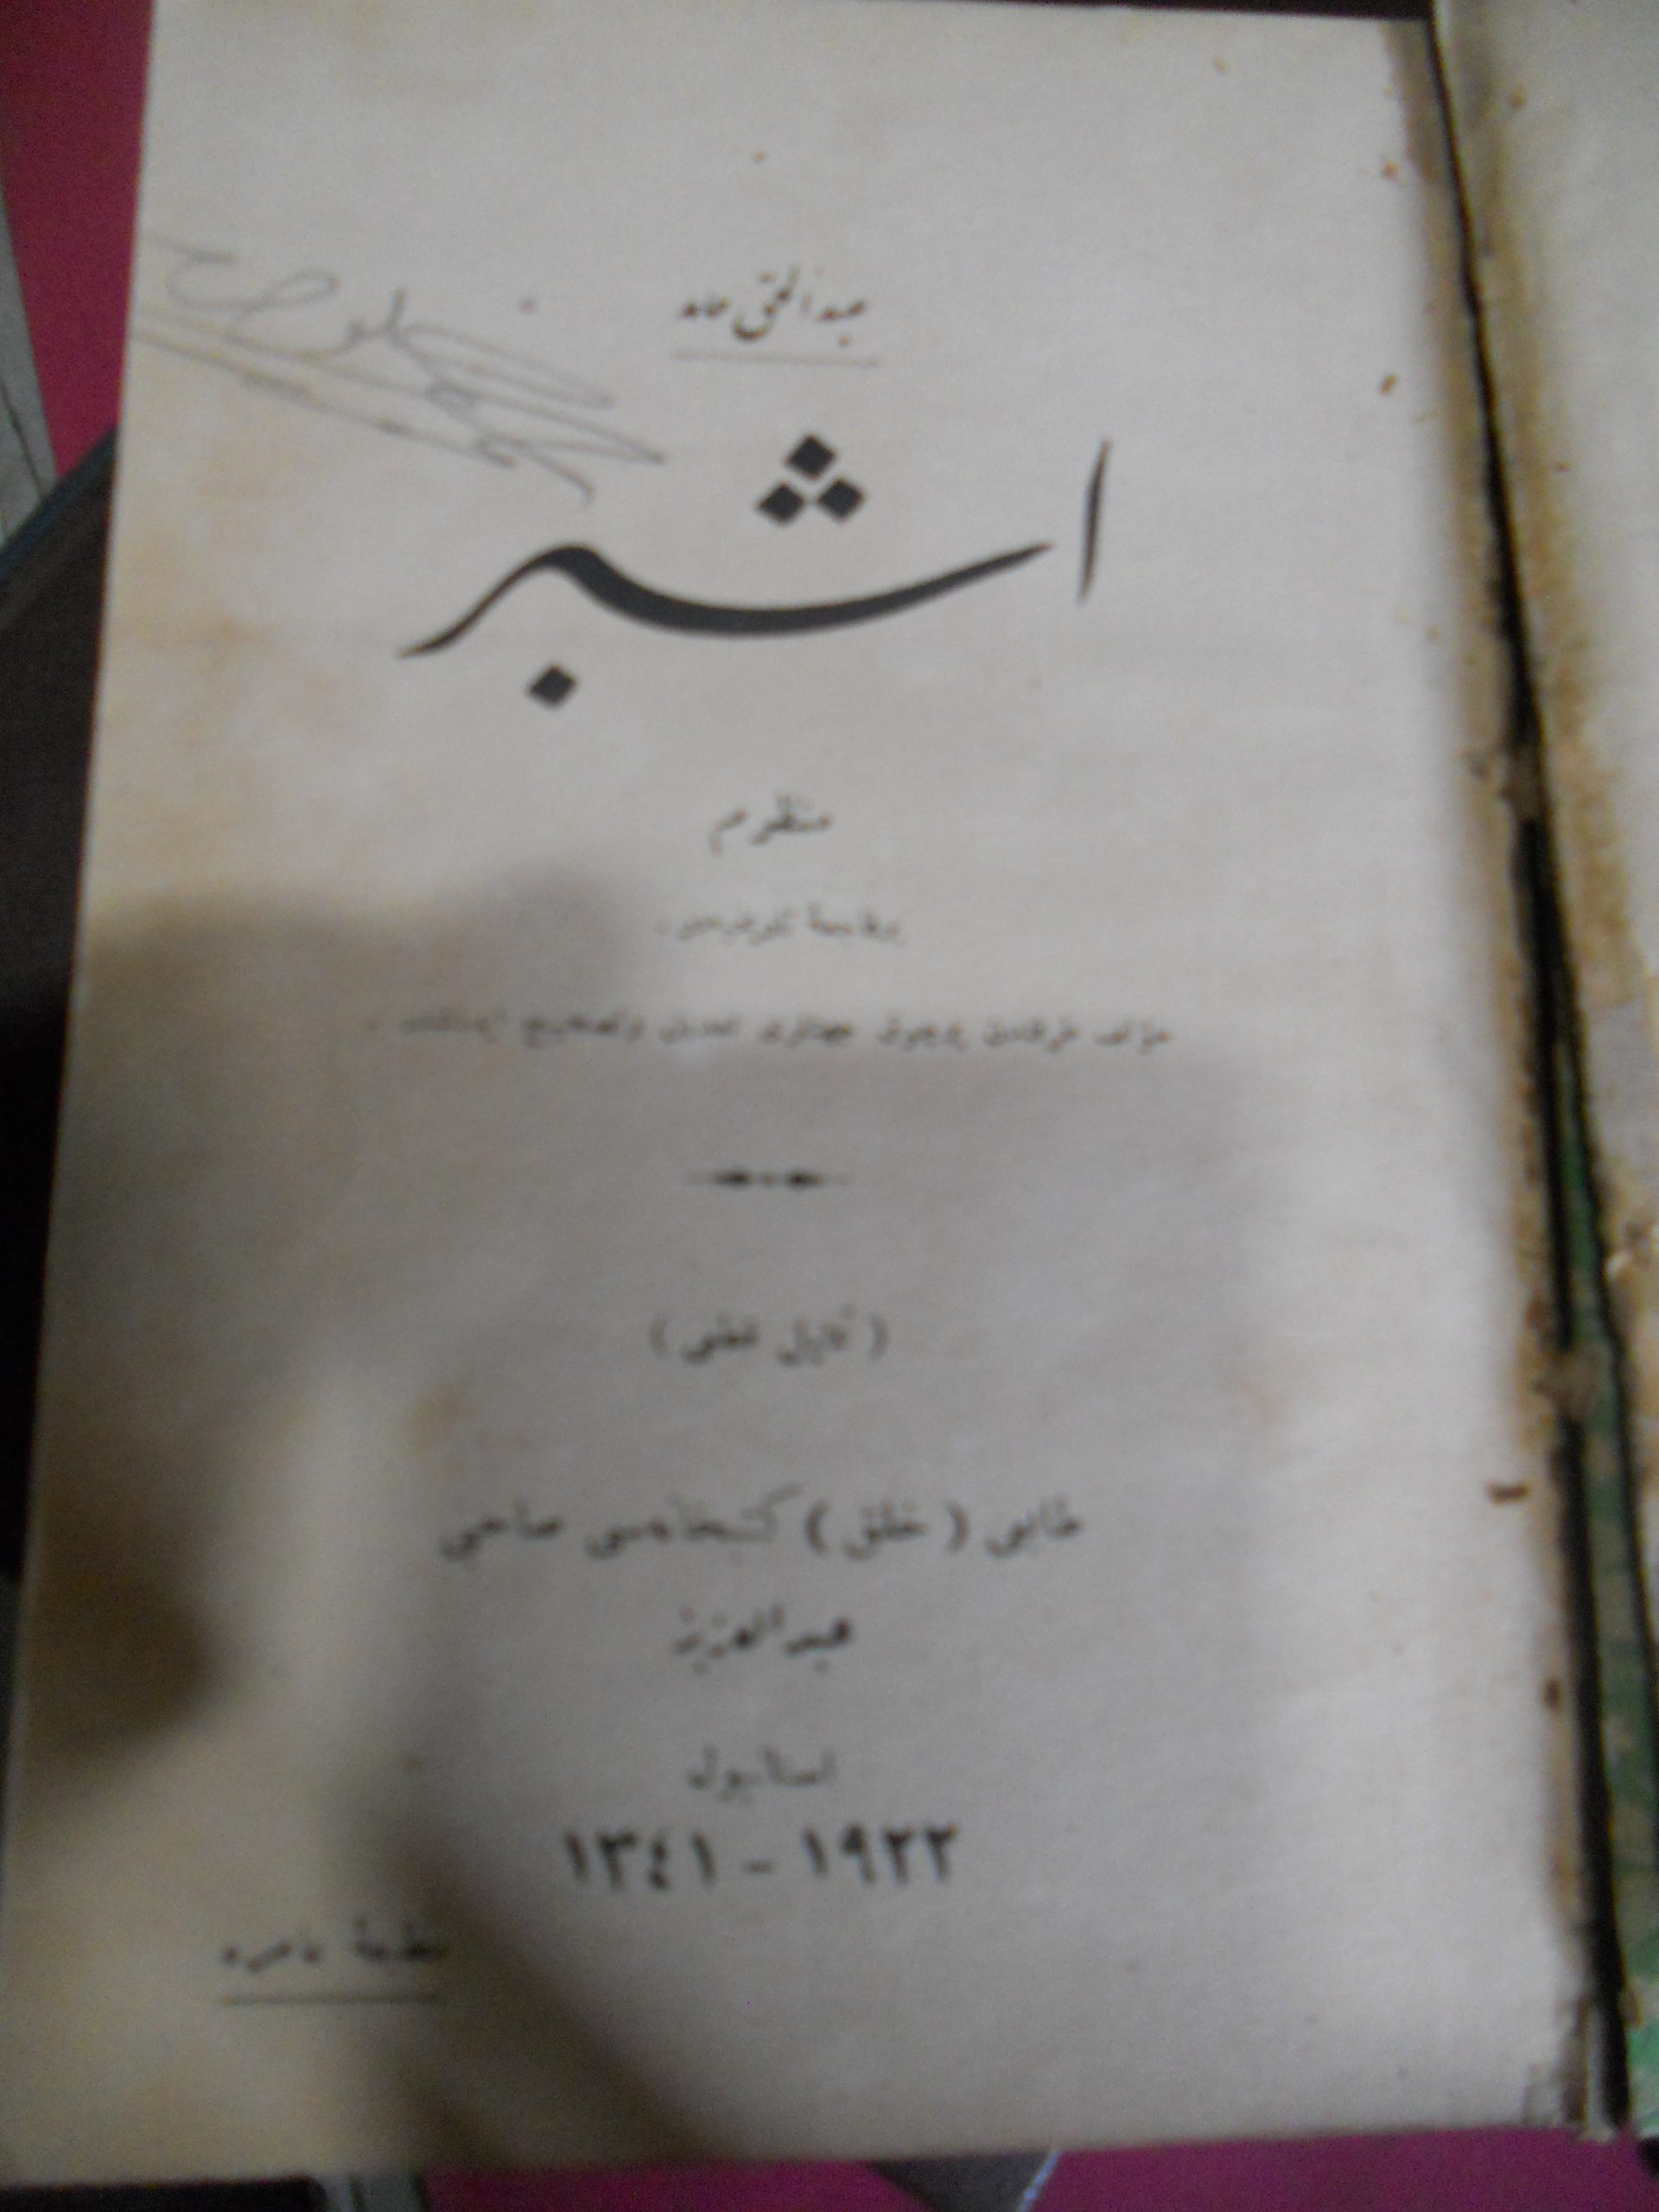 EŞBER(Osmanlıca-1922 basım)Abdülhak Hamid